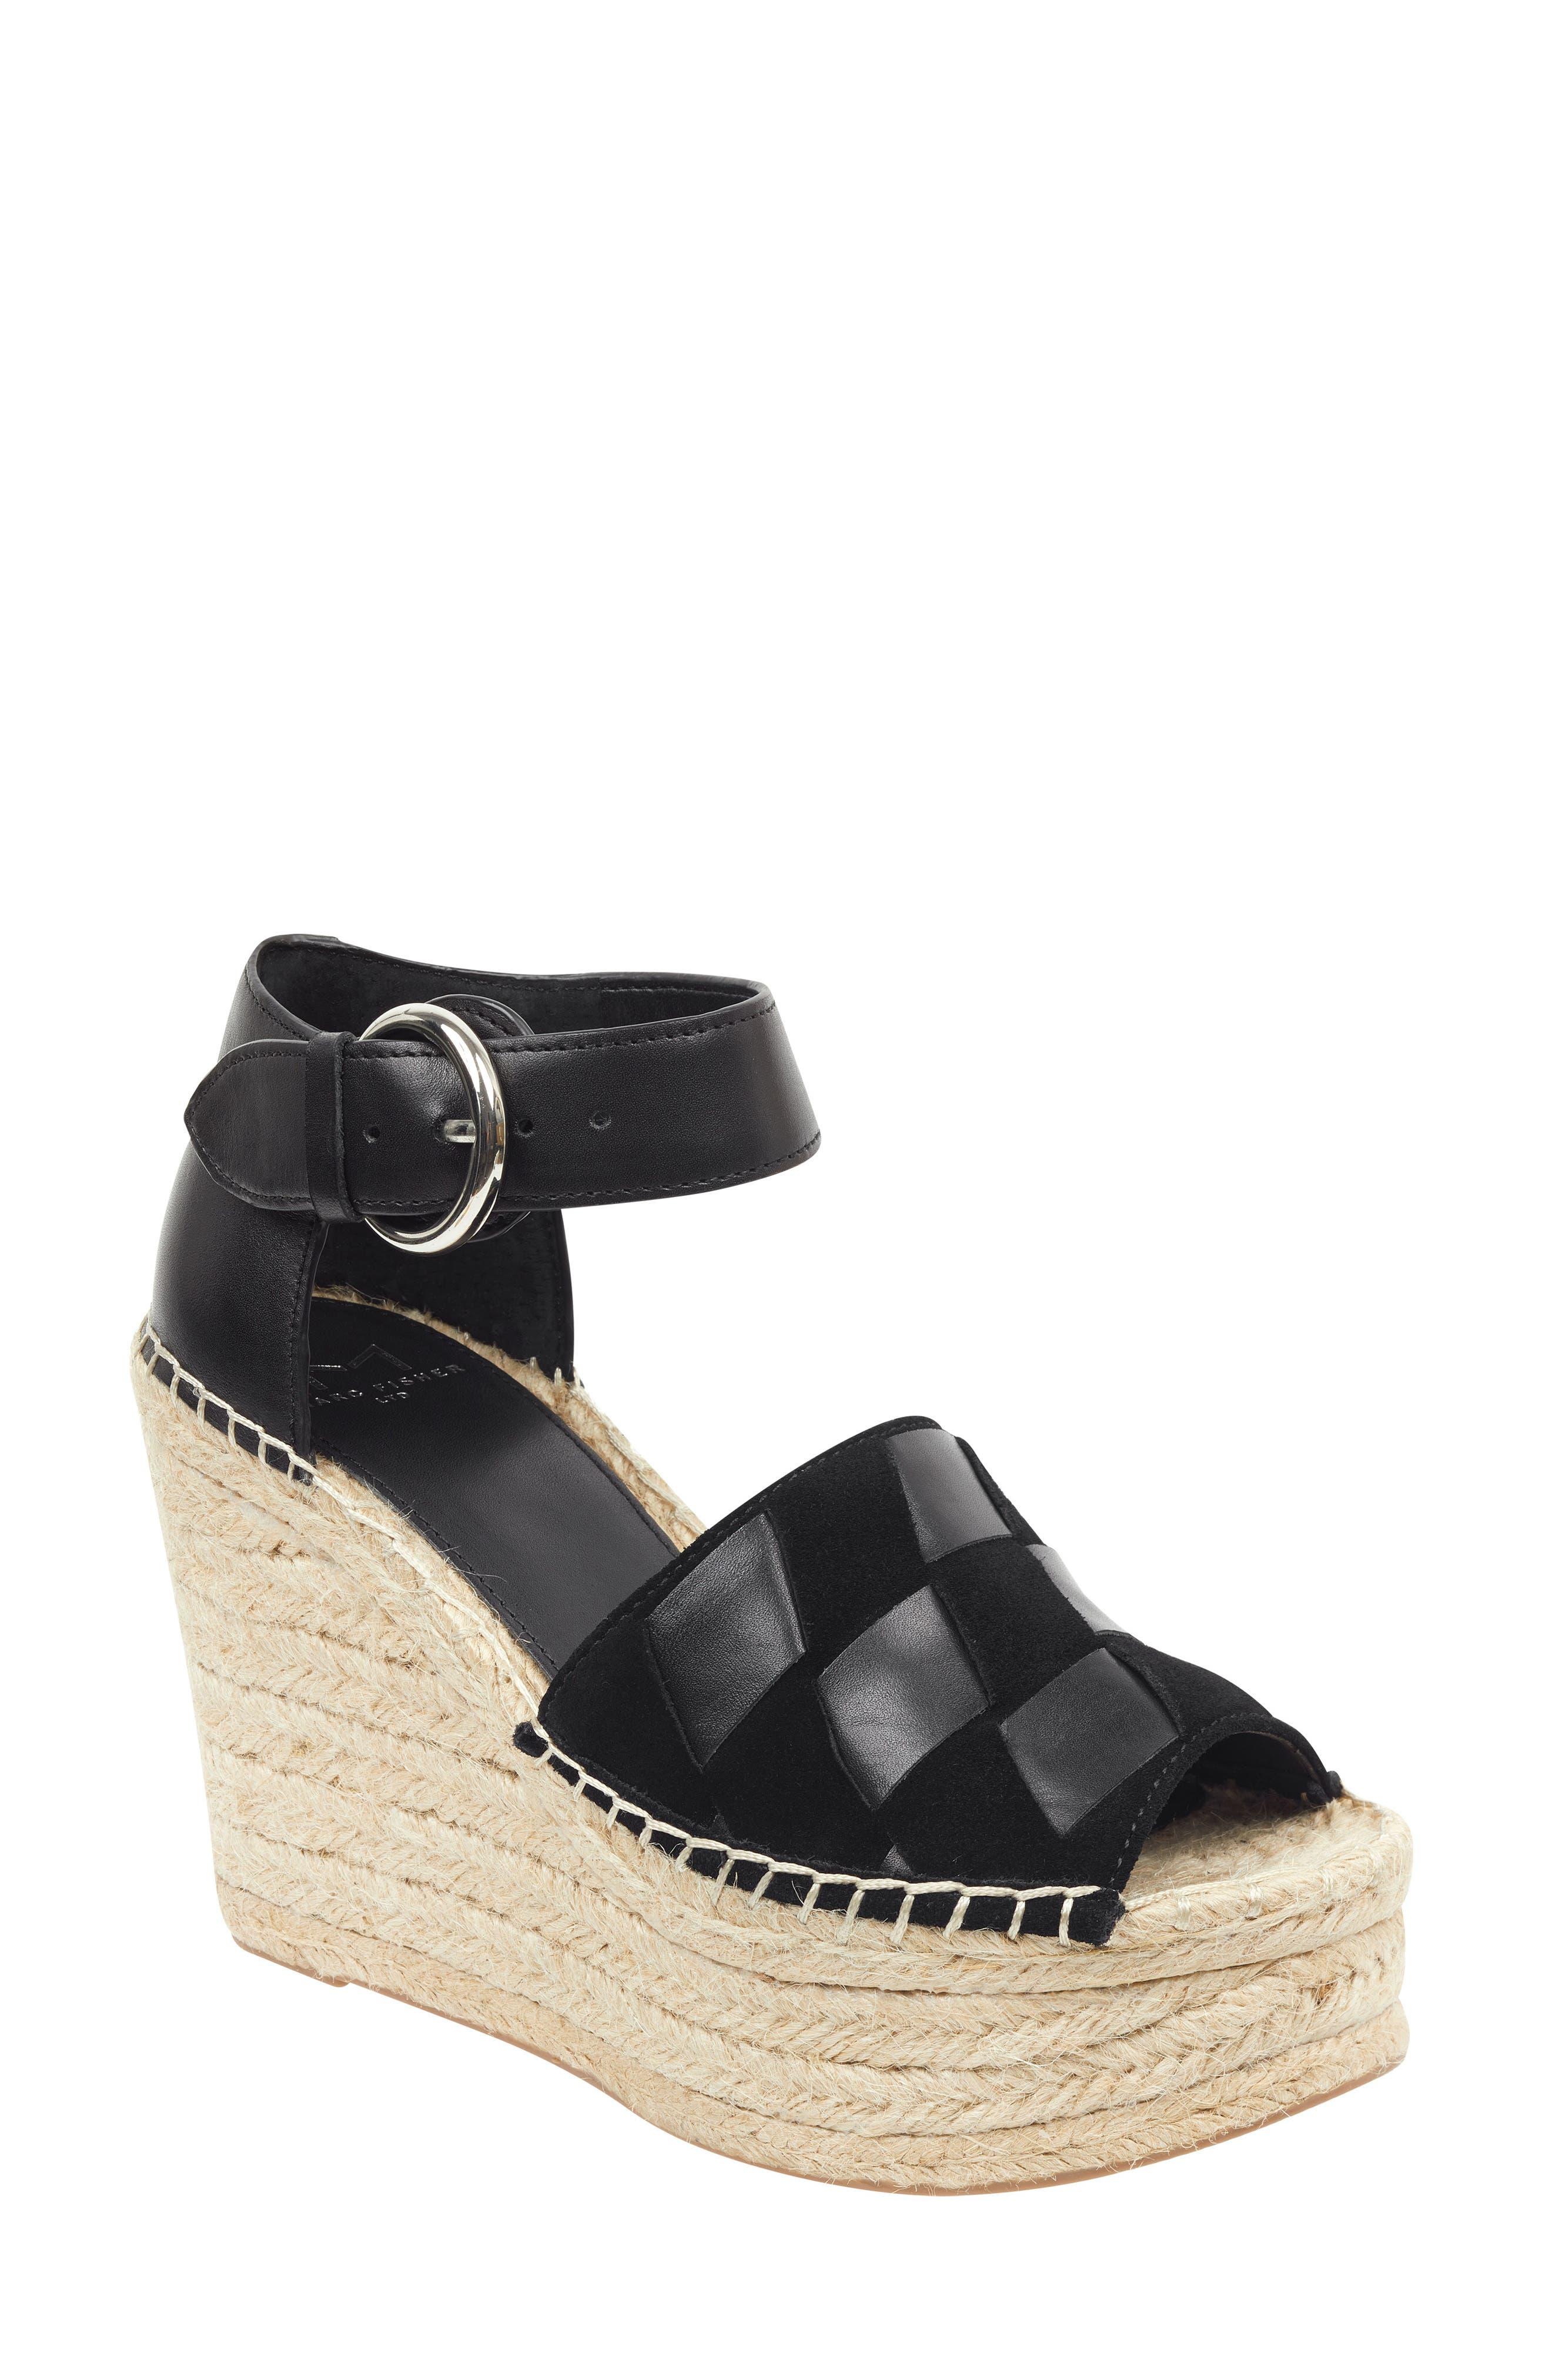 30256e9cecb Women s Marc Fisher LTD Wedge Sandals